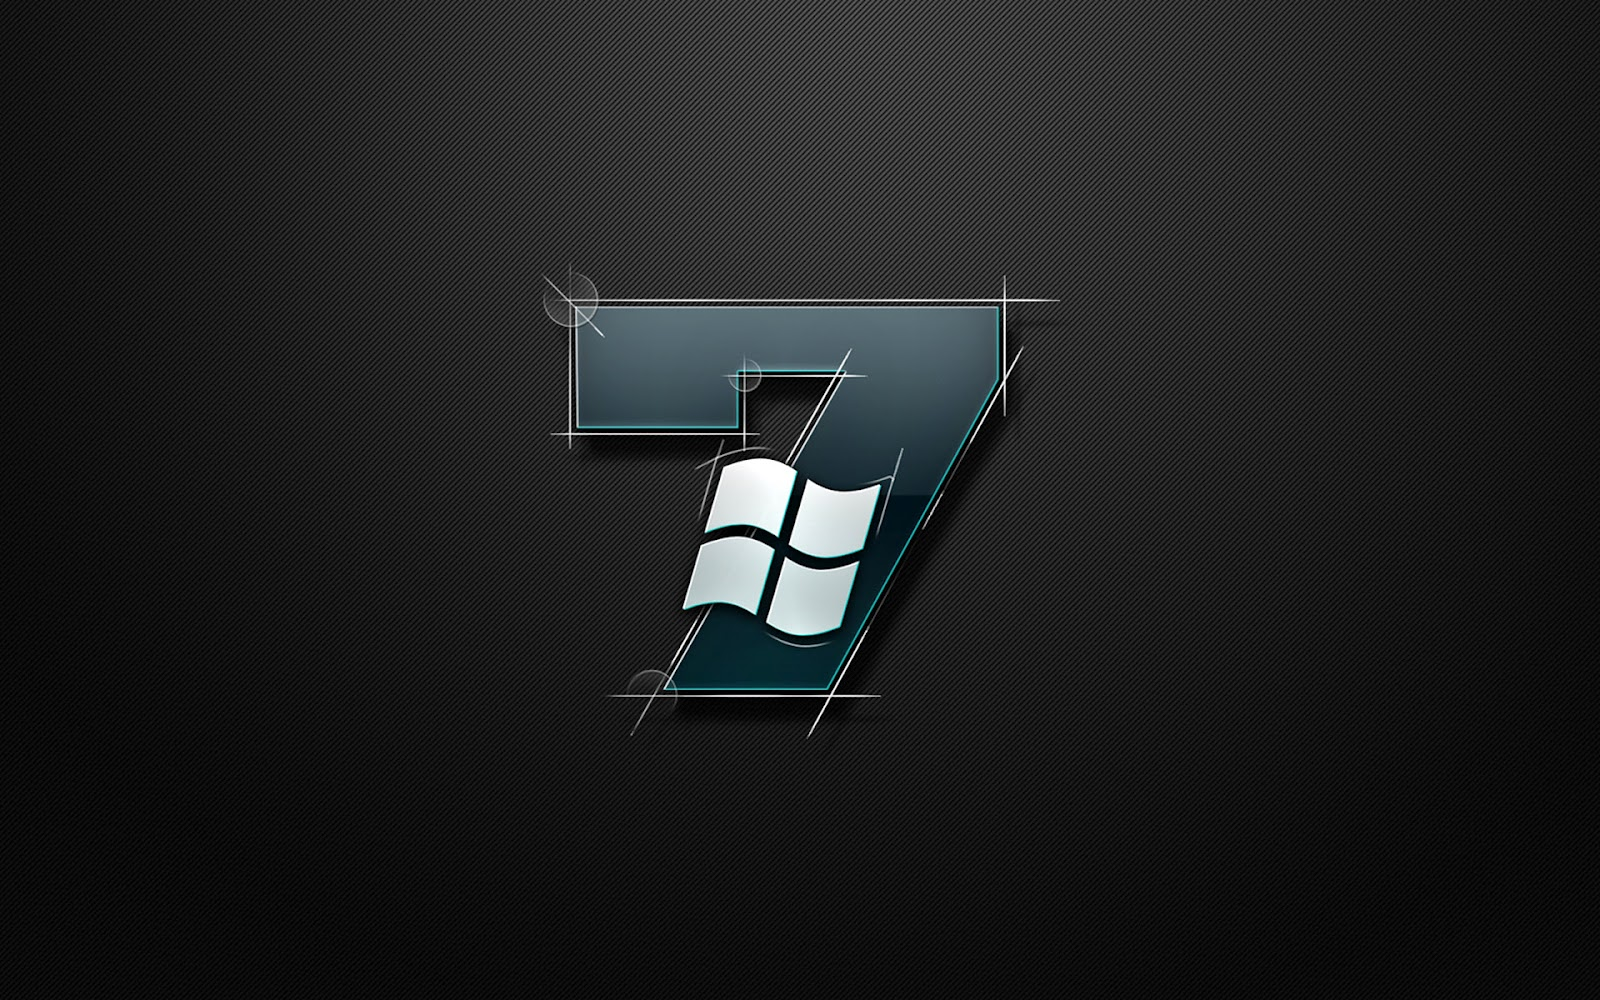 http://3.bp.blogspot.com/-sZN6roD052E/T6vniAdvVGI/AAAAAAAAAAU/ElYfxT6l97M/s1600/wxp+%281%29.jpg